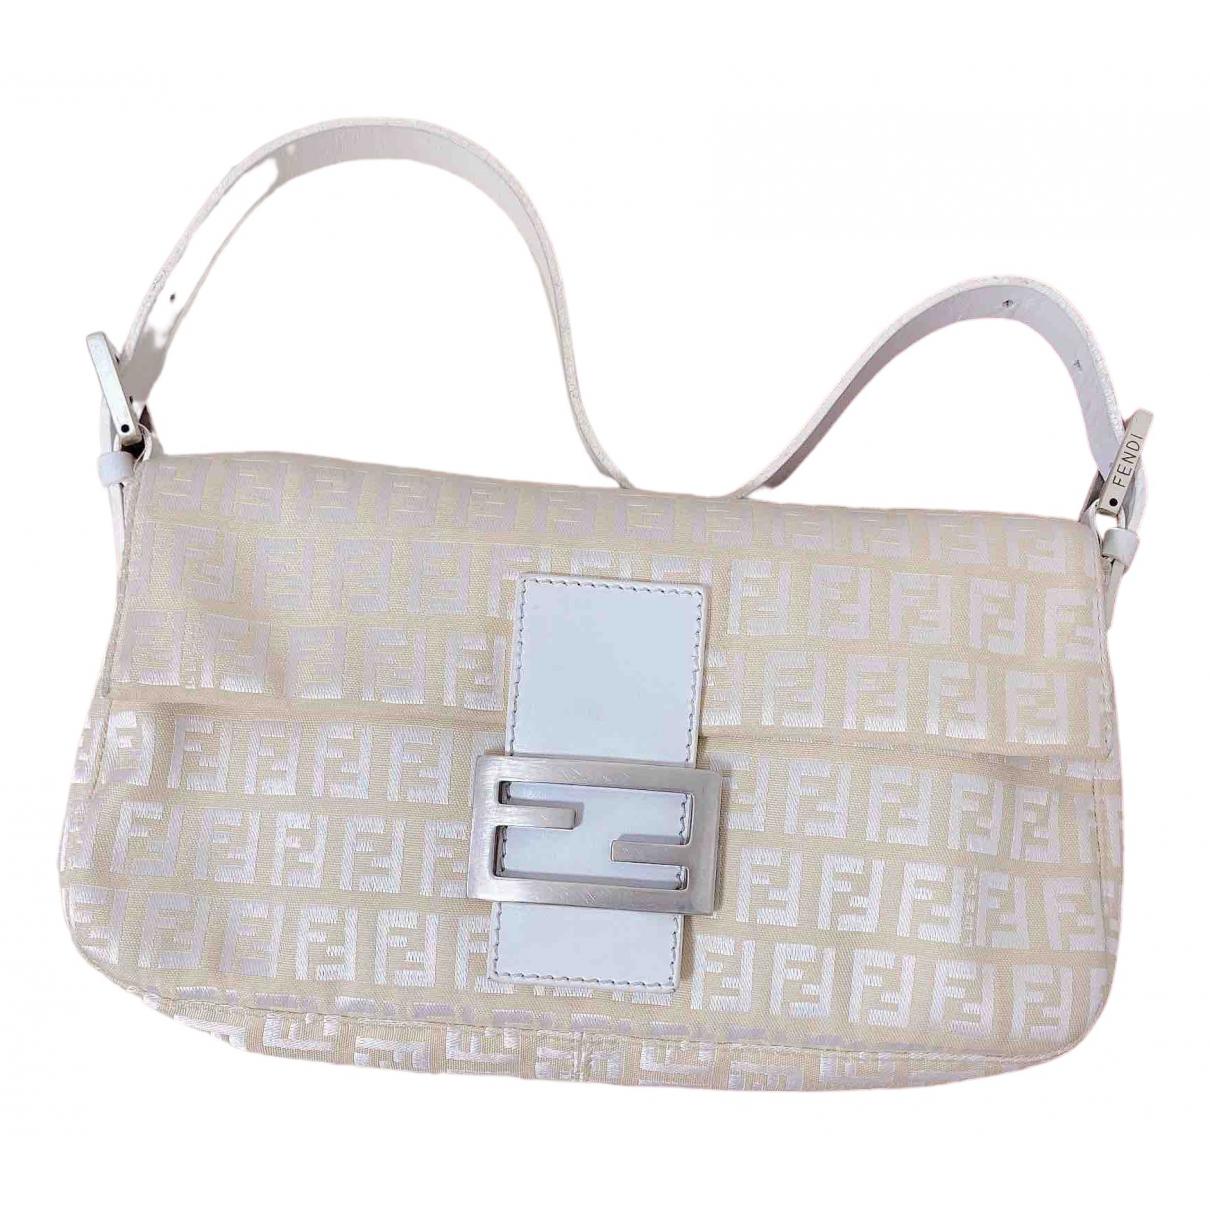 Fendi Baguette Handtasche in  Ecru Leinen